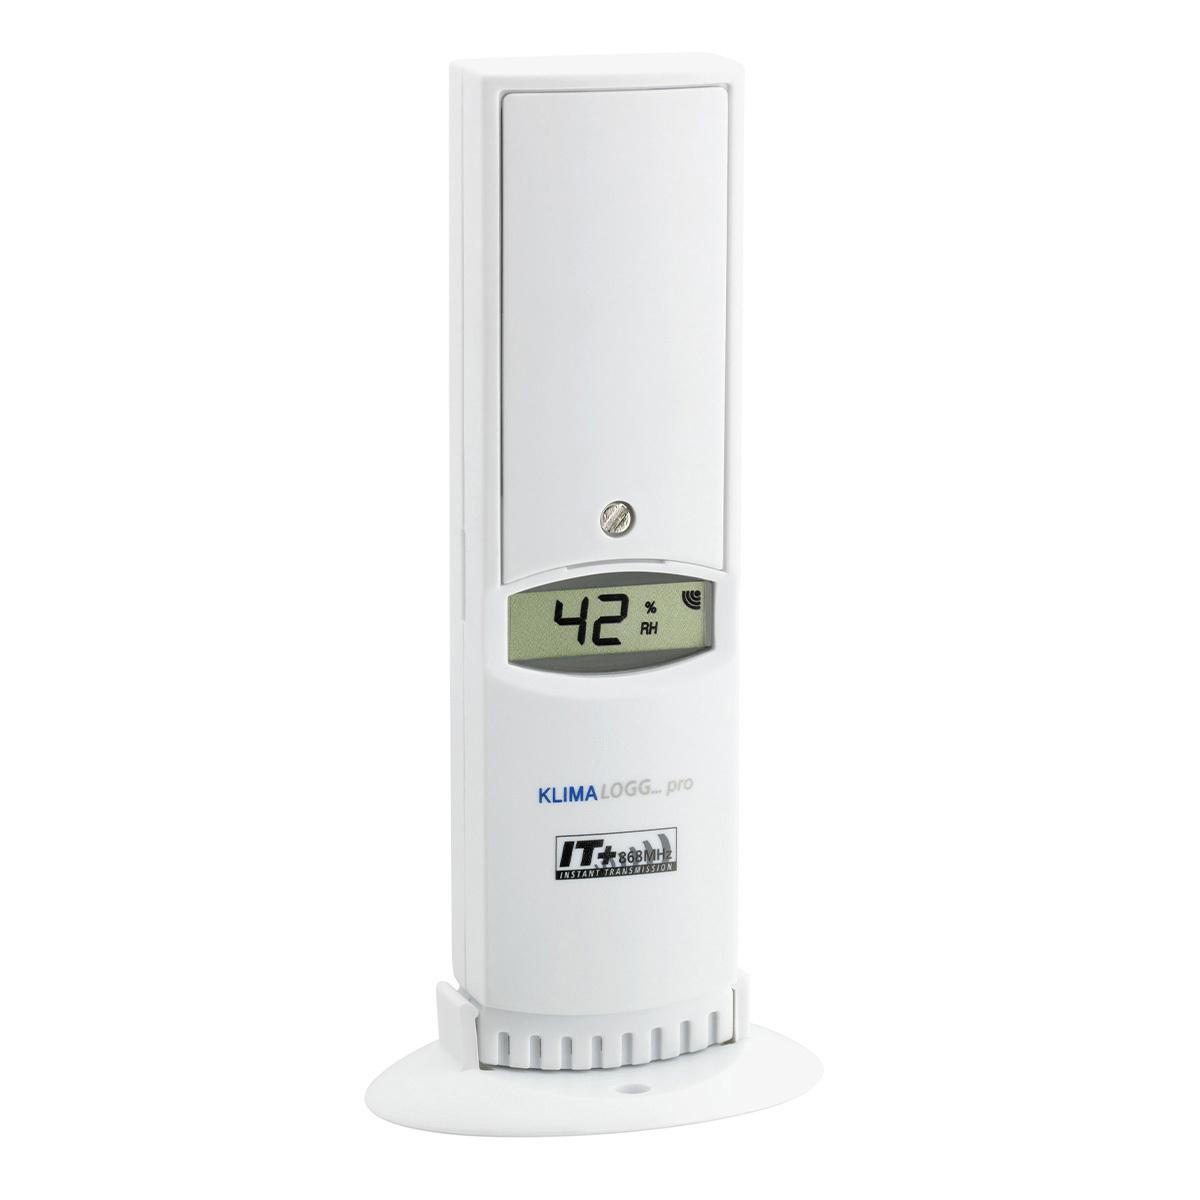 30-3180-it-thermo-hygro-sender-1200x200px.jpg